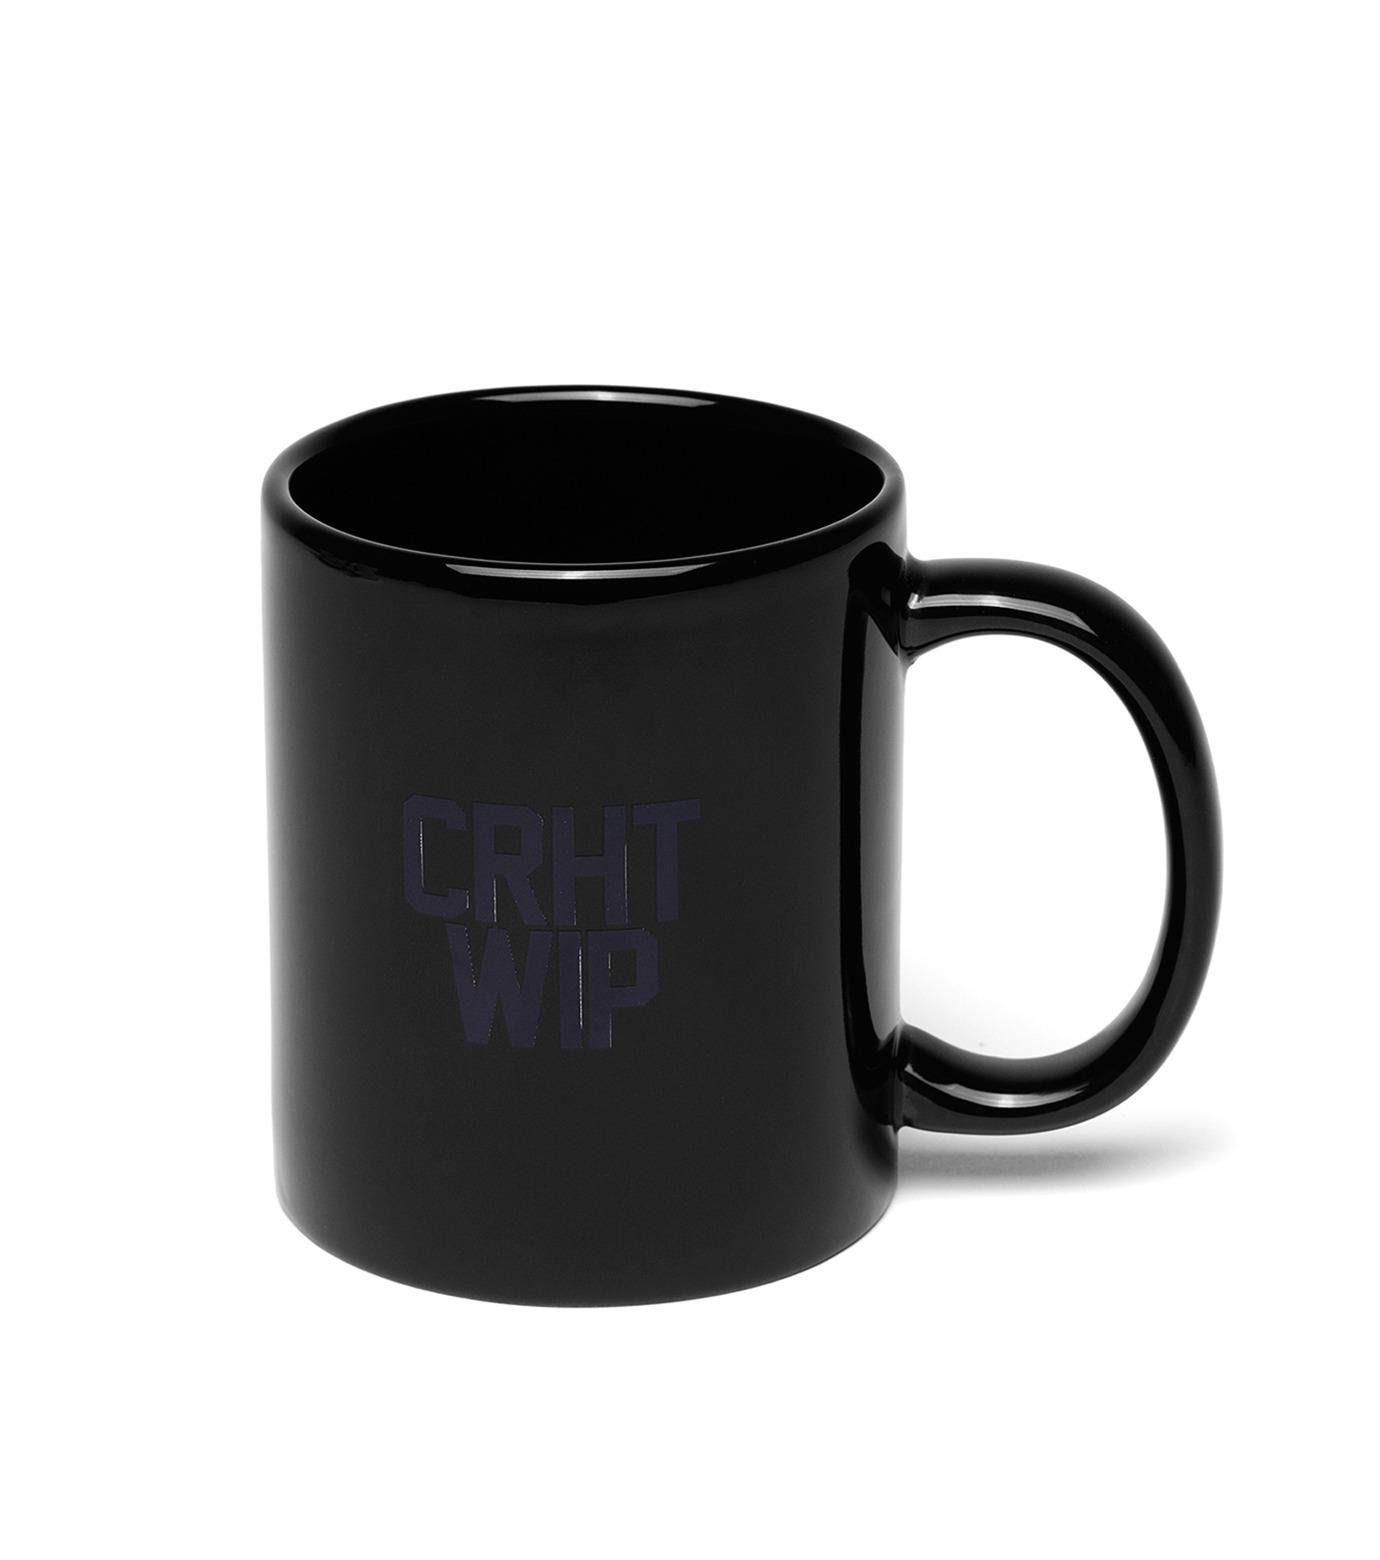 Carhartt(カーハート)のCOFFEE MUG-BLACK(キッチン/kitchen)-I018142-15F-13 拡大詳細画像2